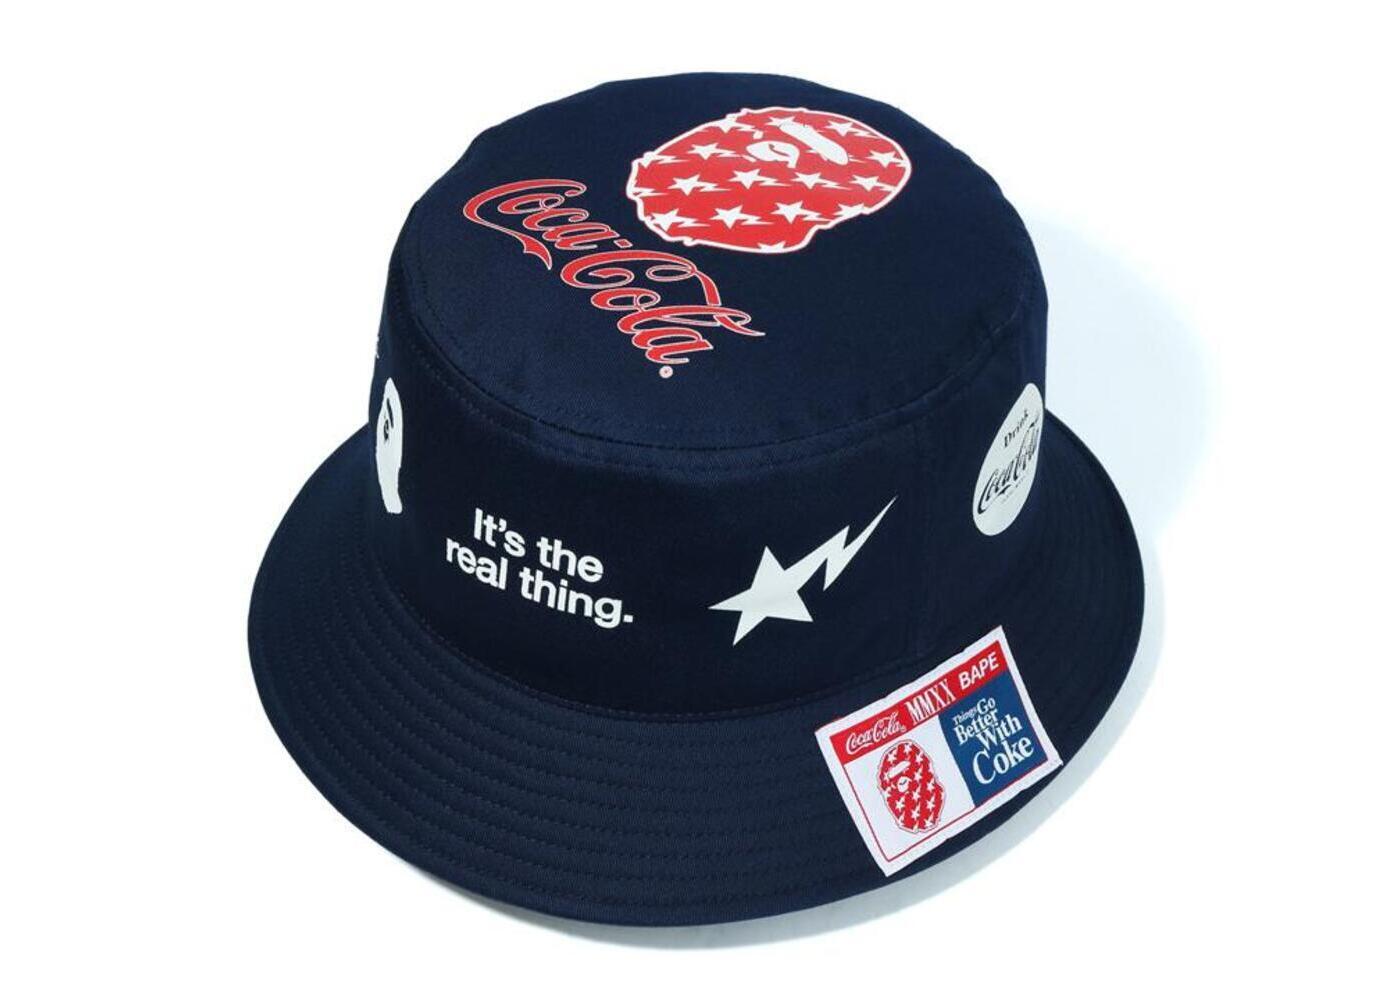 Bape x Coca Cola Bucket Hat Navy (SS20)の写真